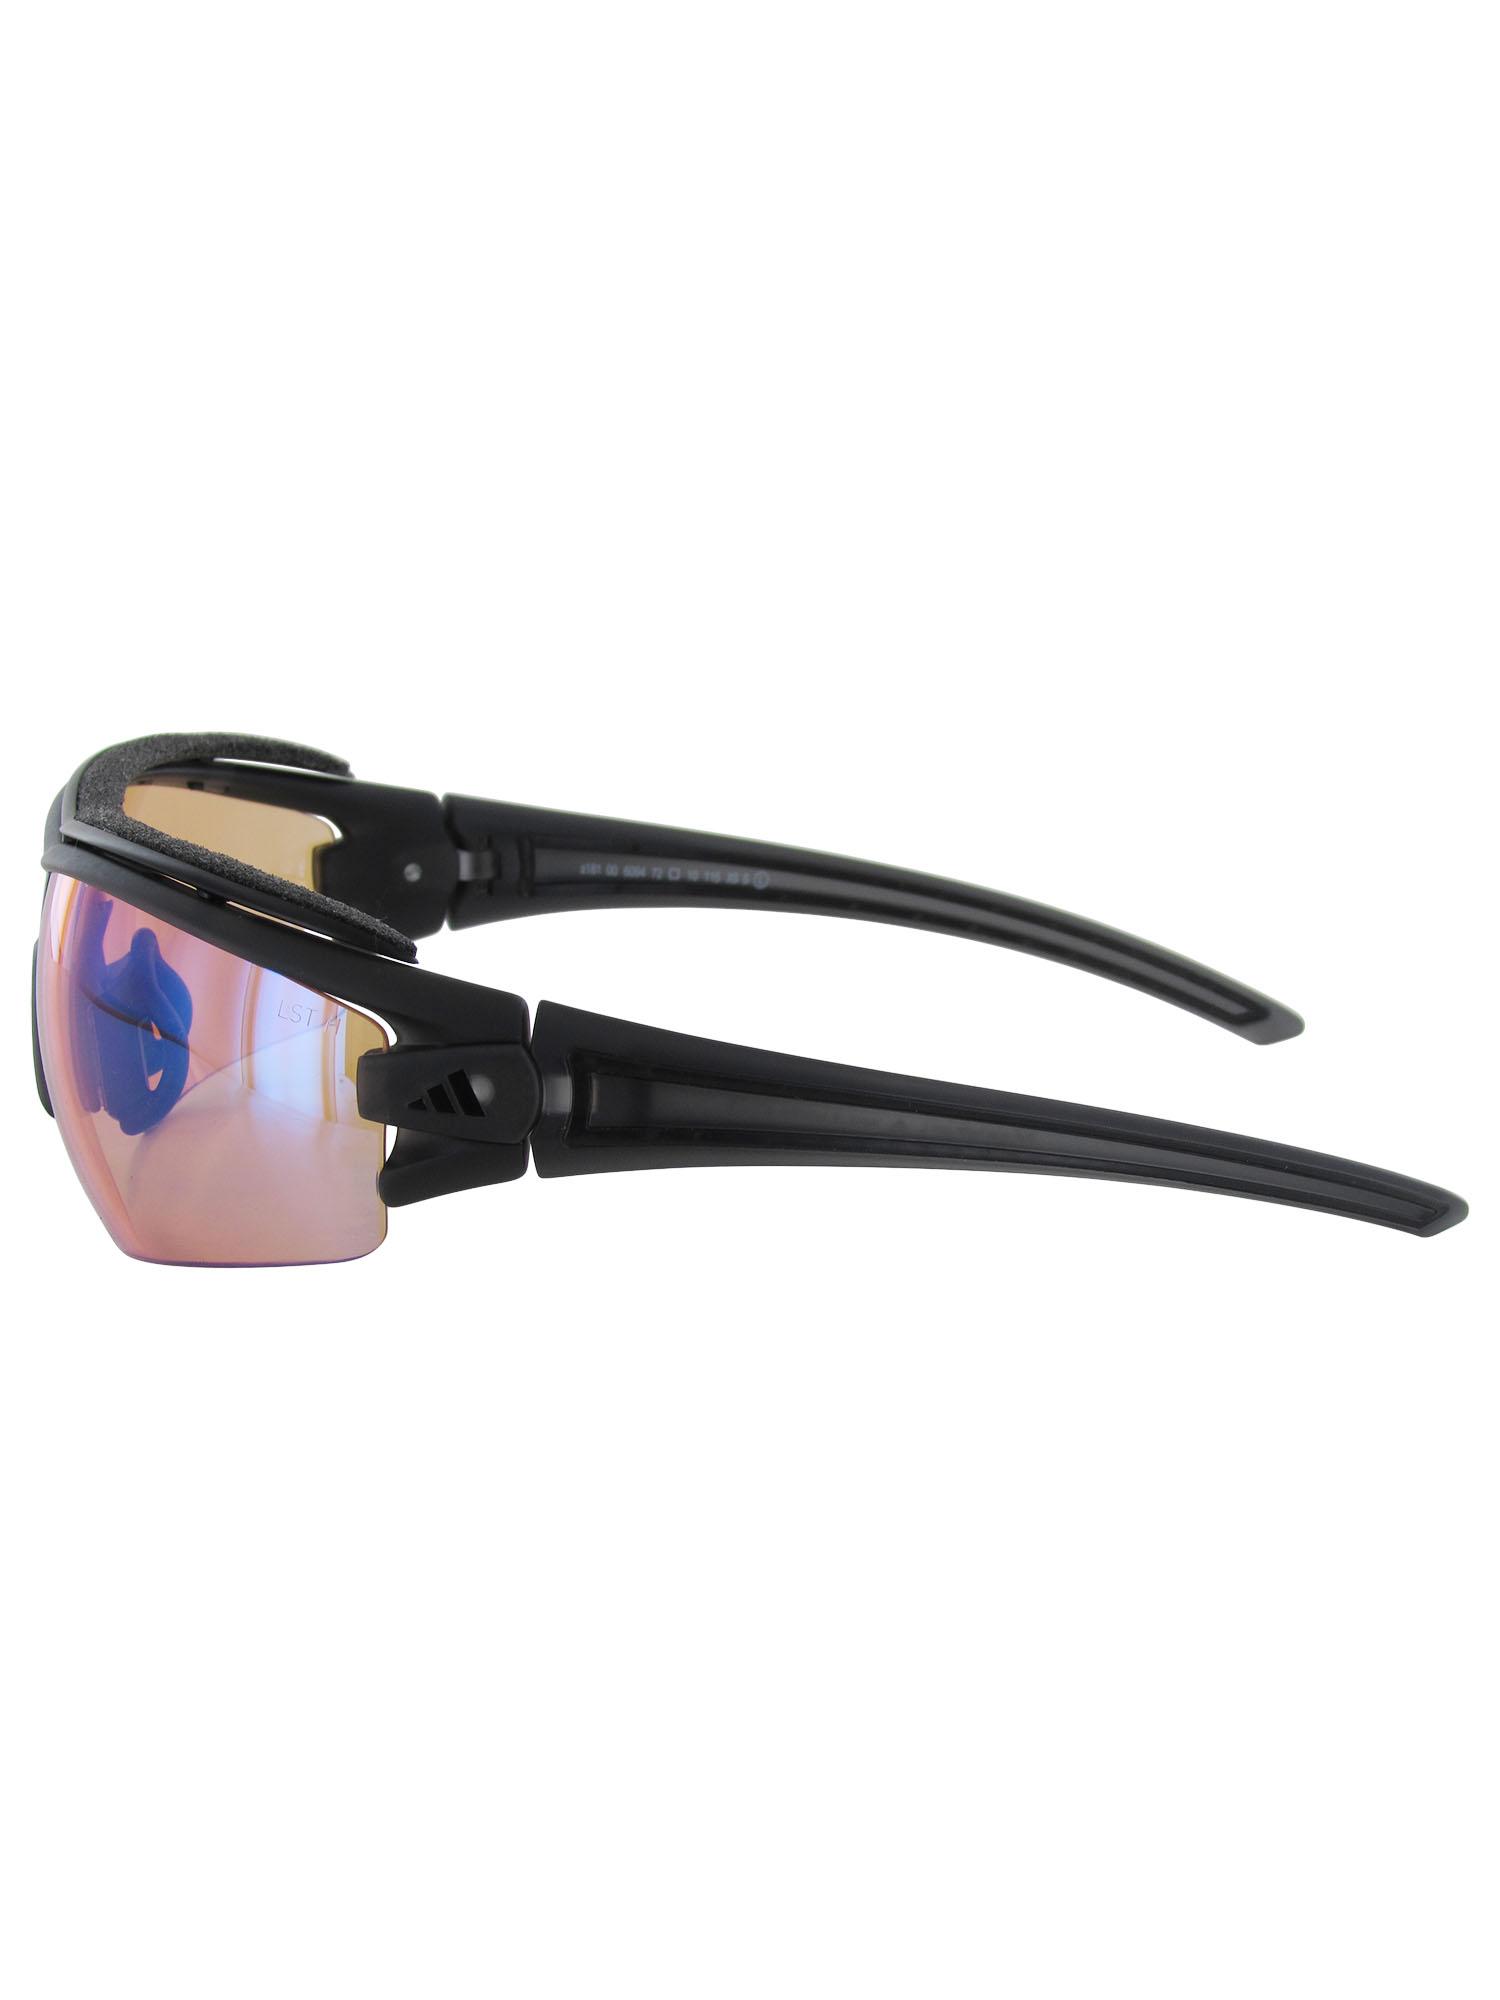 Adidas-Evil-Eye-Halfrim-Pro-XS-Sunglasses thumbnail 3